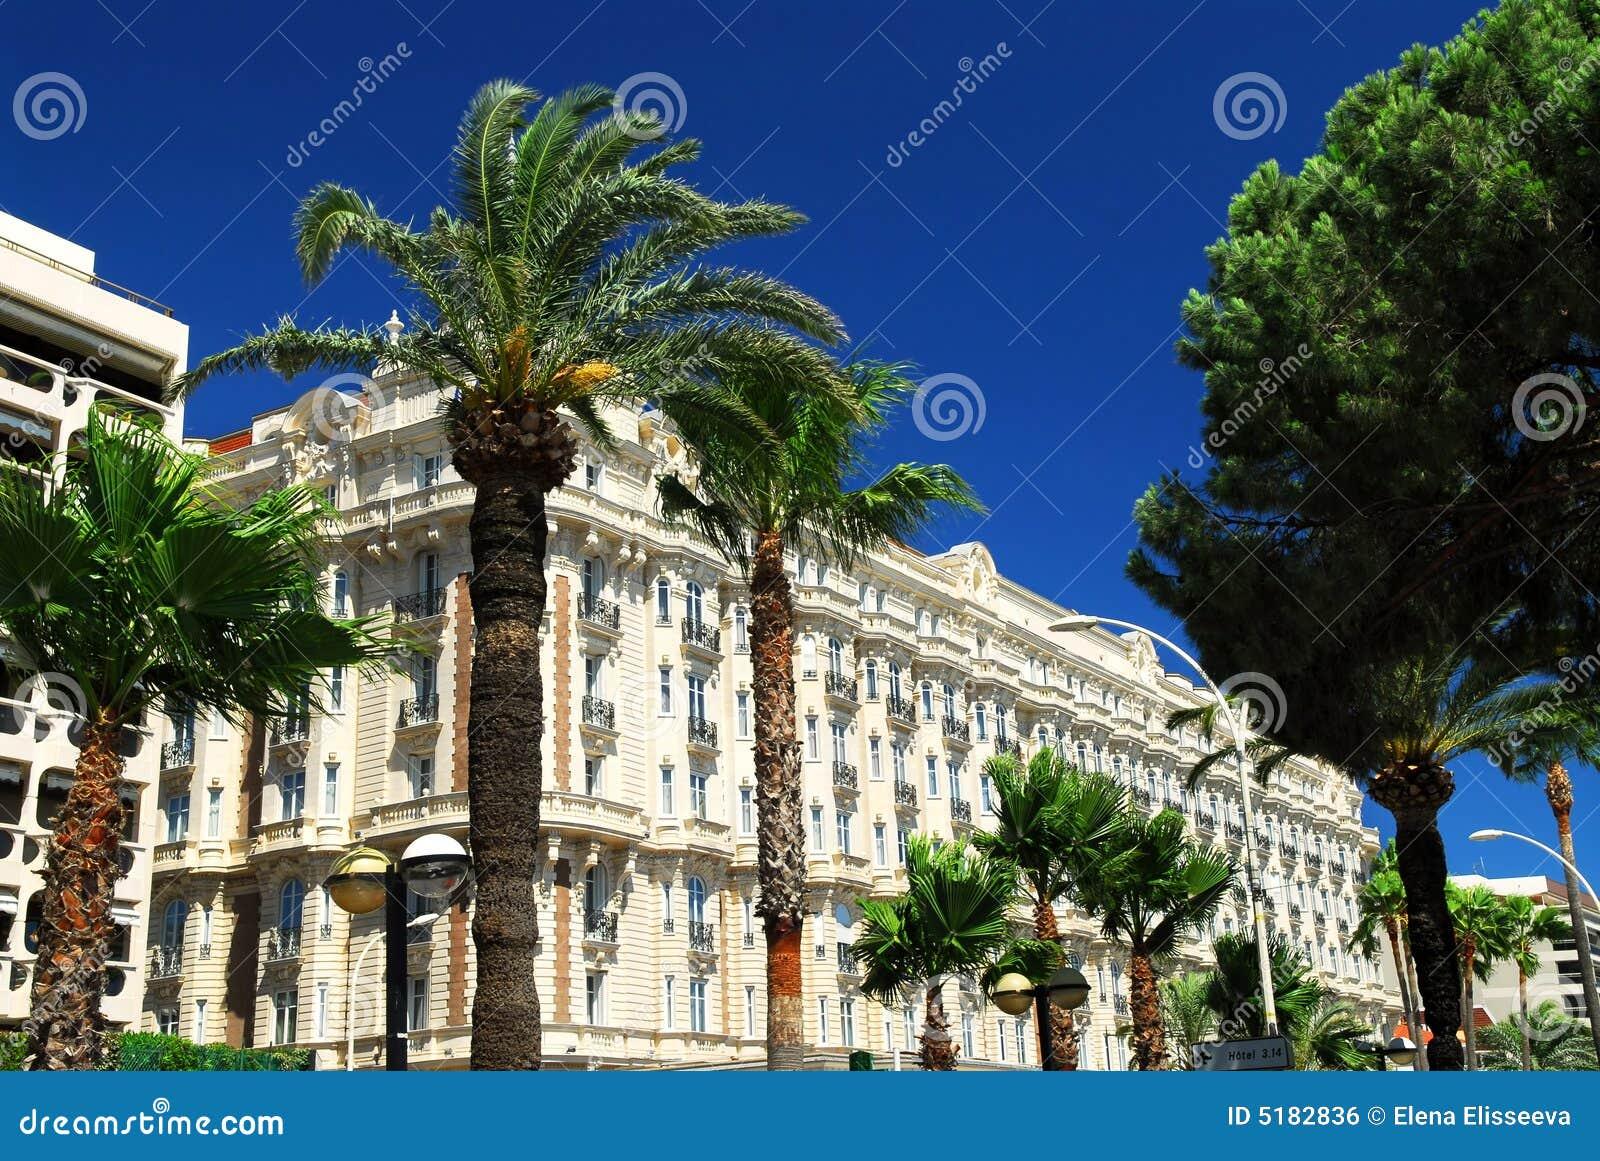 Passeio de Croisette em Cannes